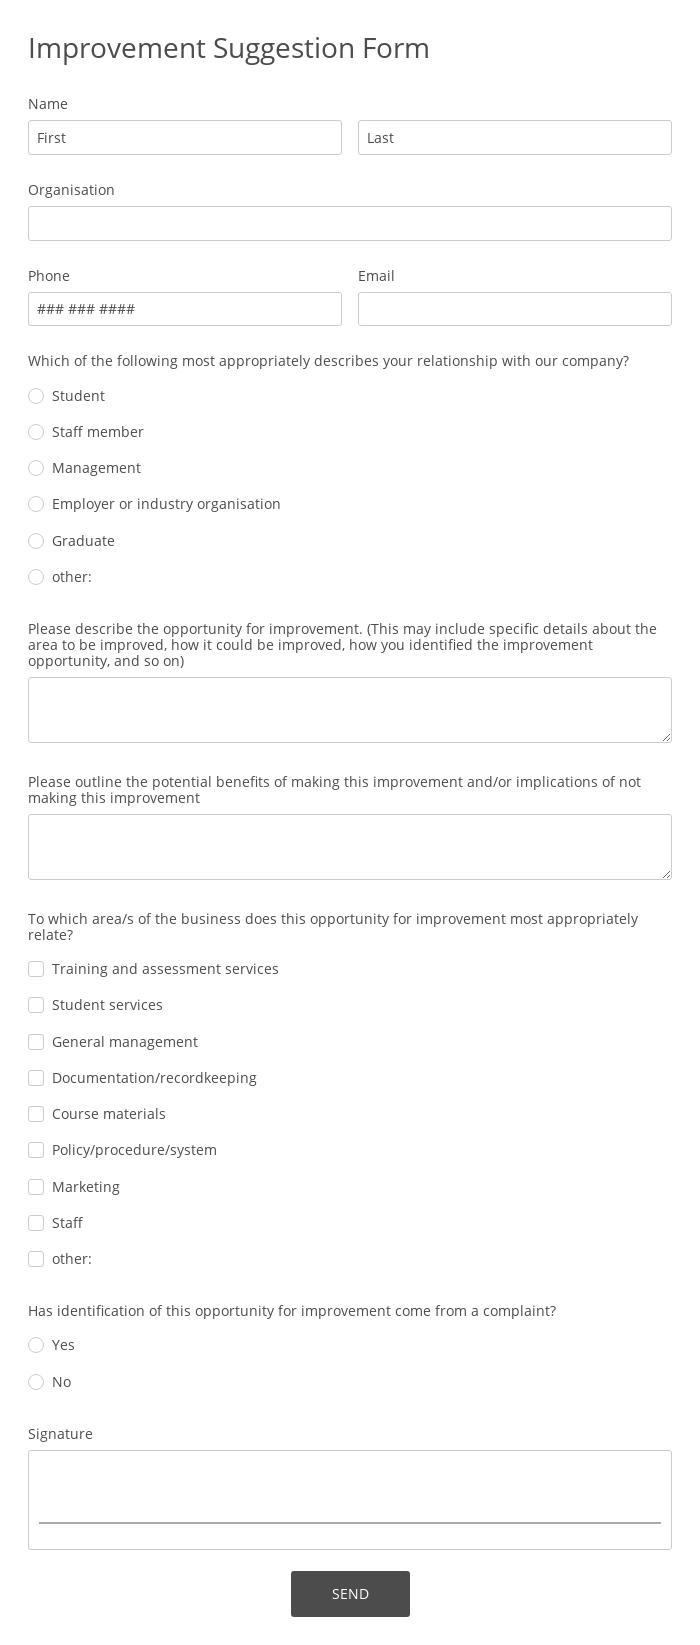 Improvement Suggestion Form